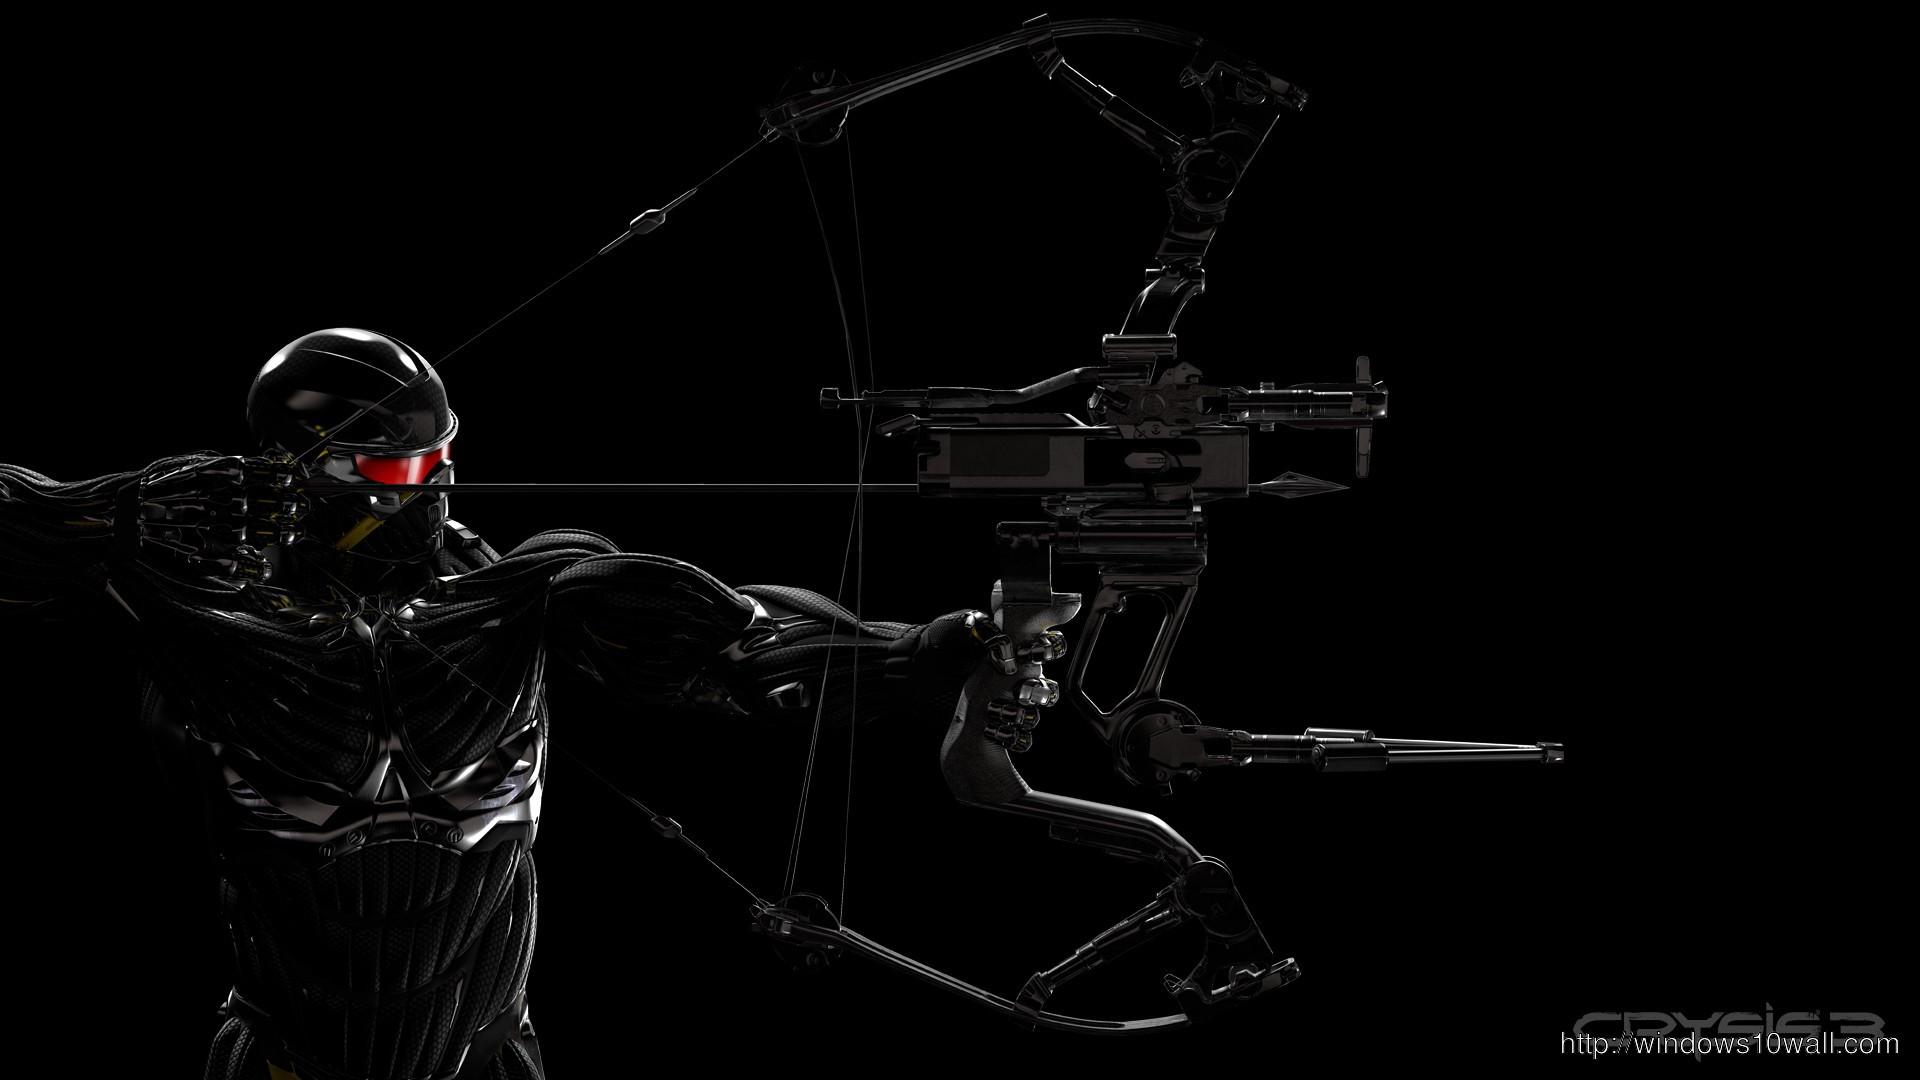 Crysis Game Screenshot Wallpaper